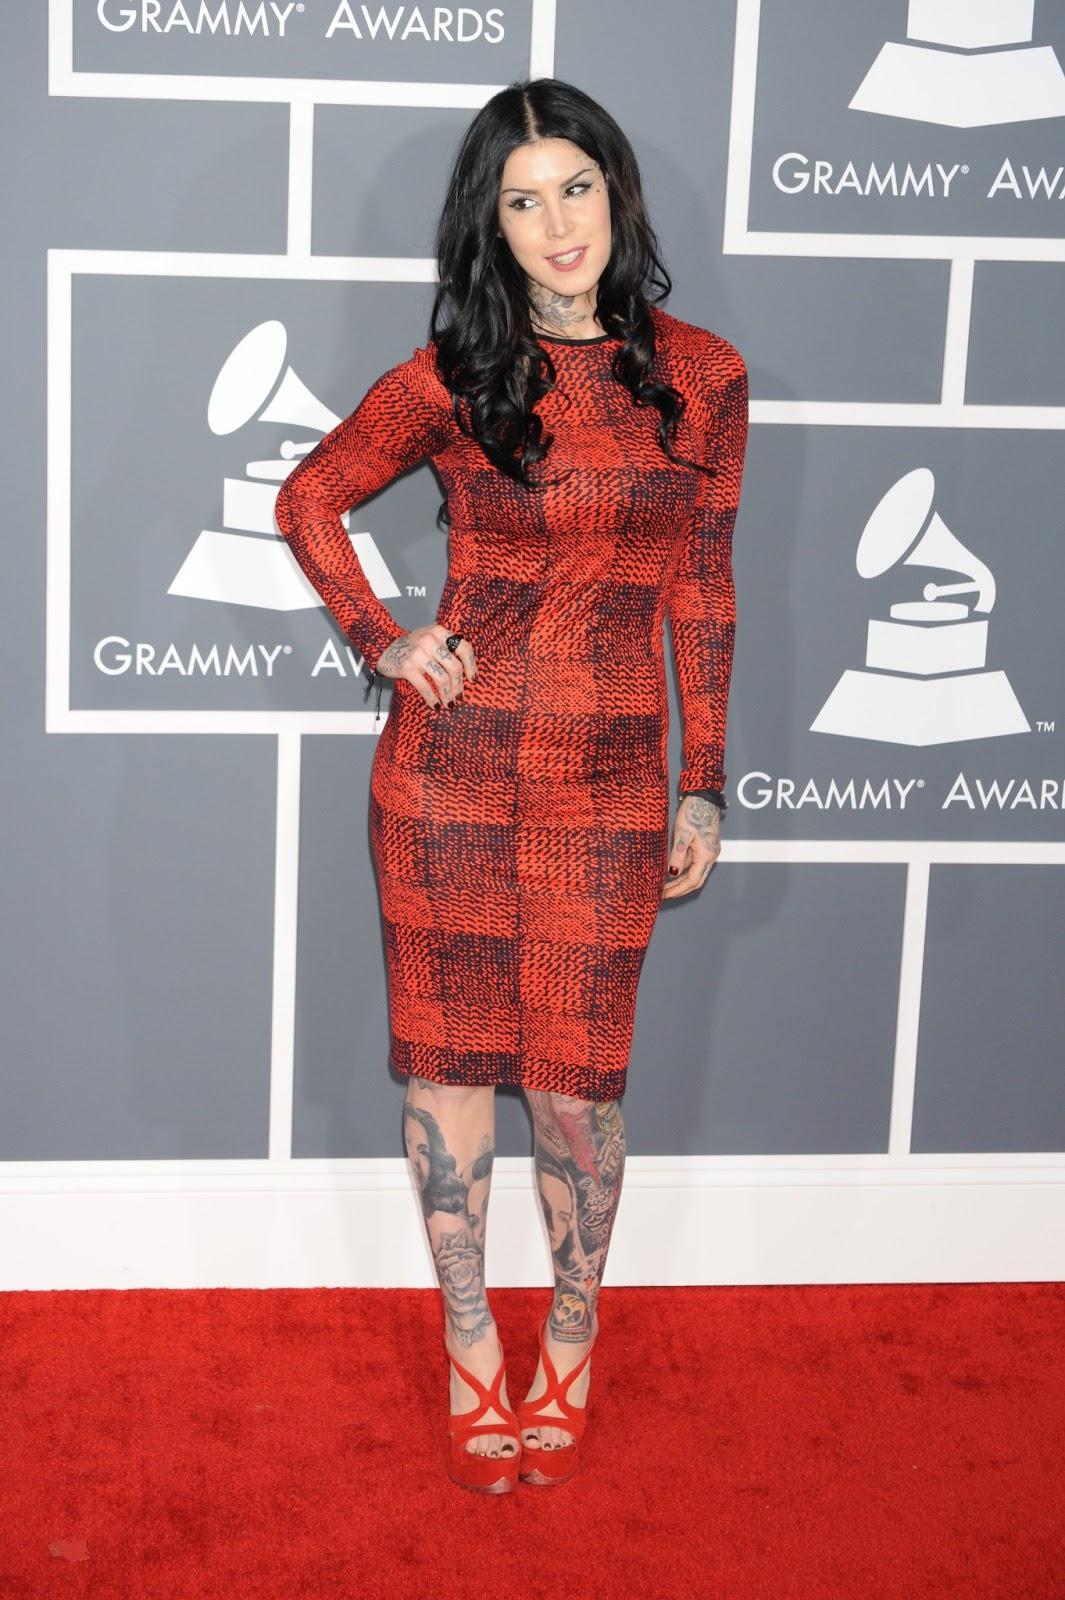 Fashion Style Grammy Awards 2013